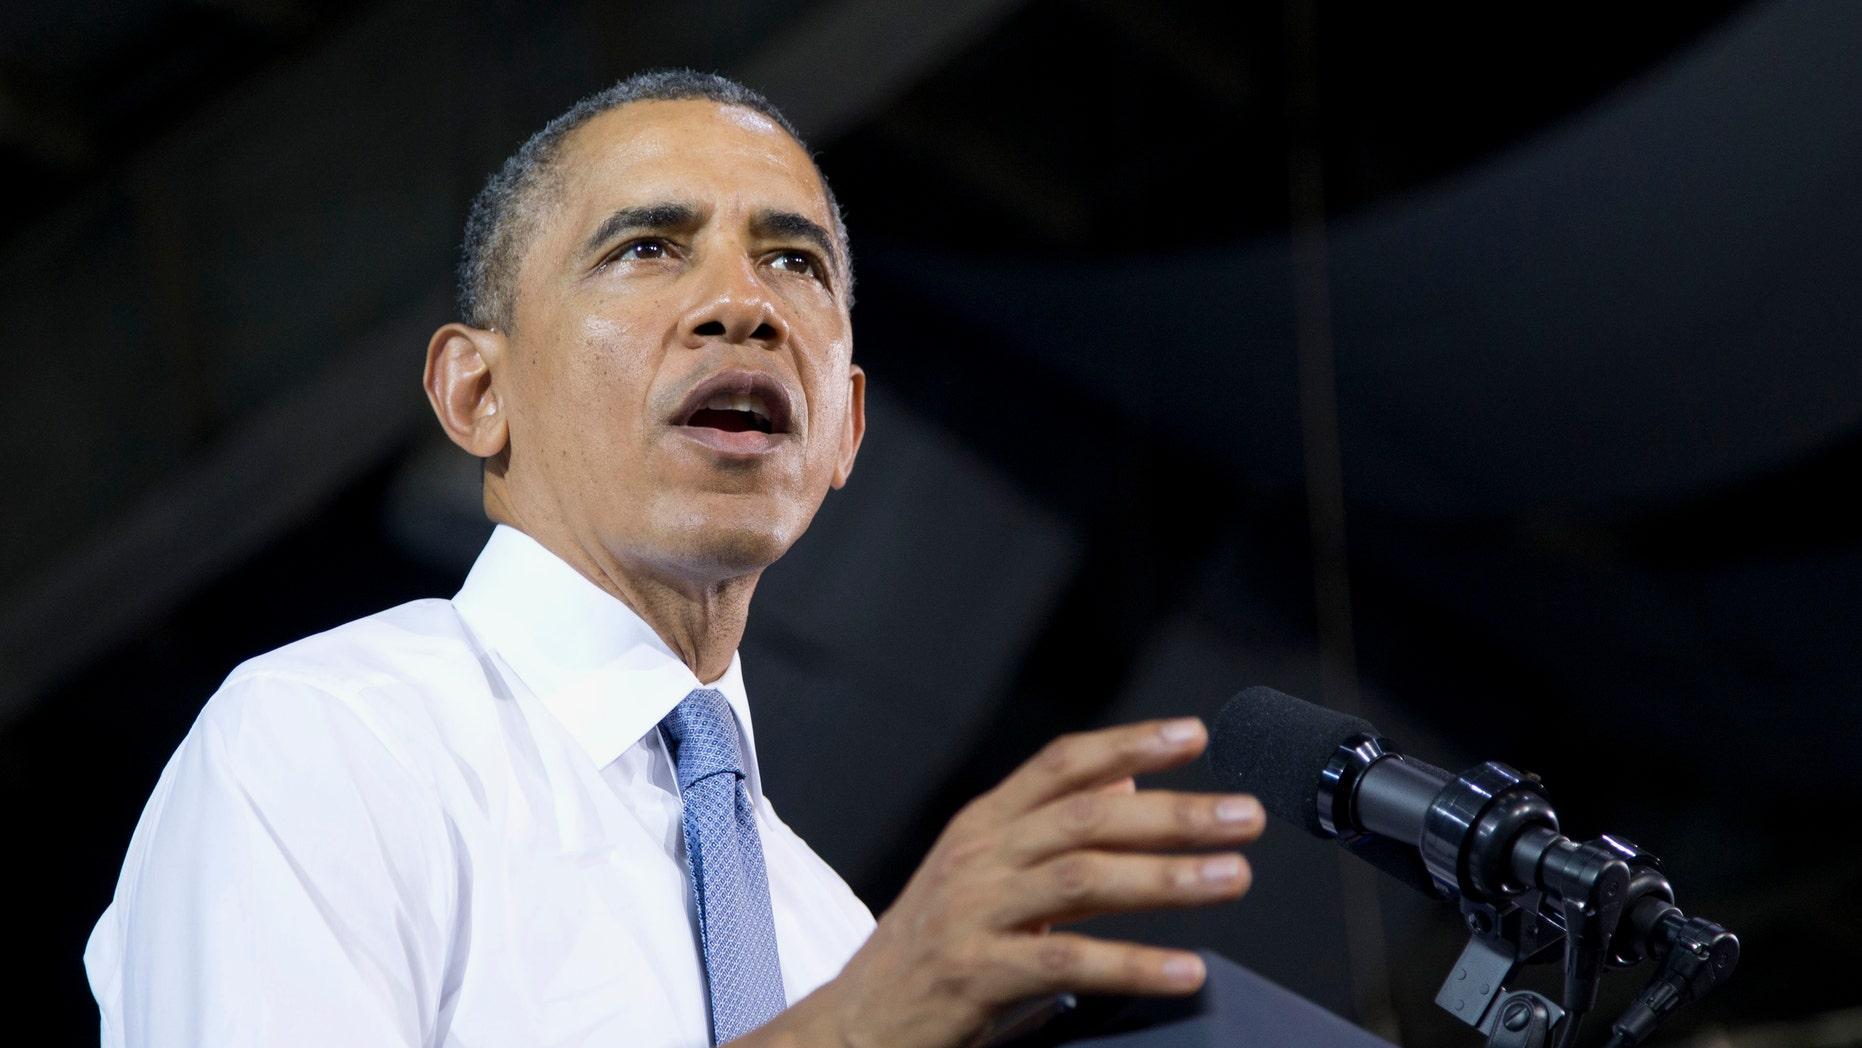 April 29, 2014: President Obama speaks at Fort Bonifacio in Taguig city, outside of Manila, Philippines.